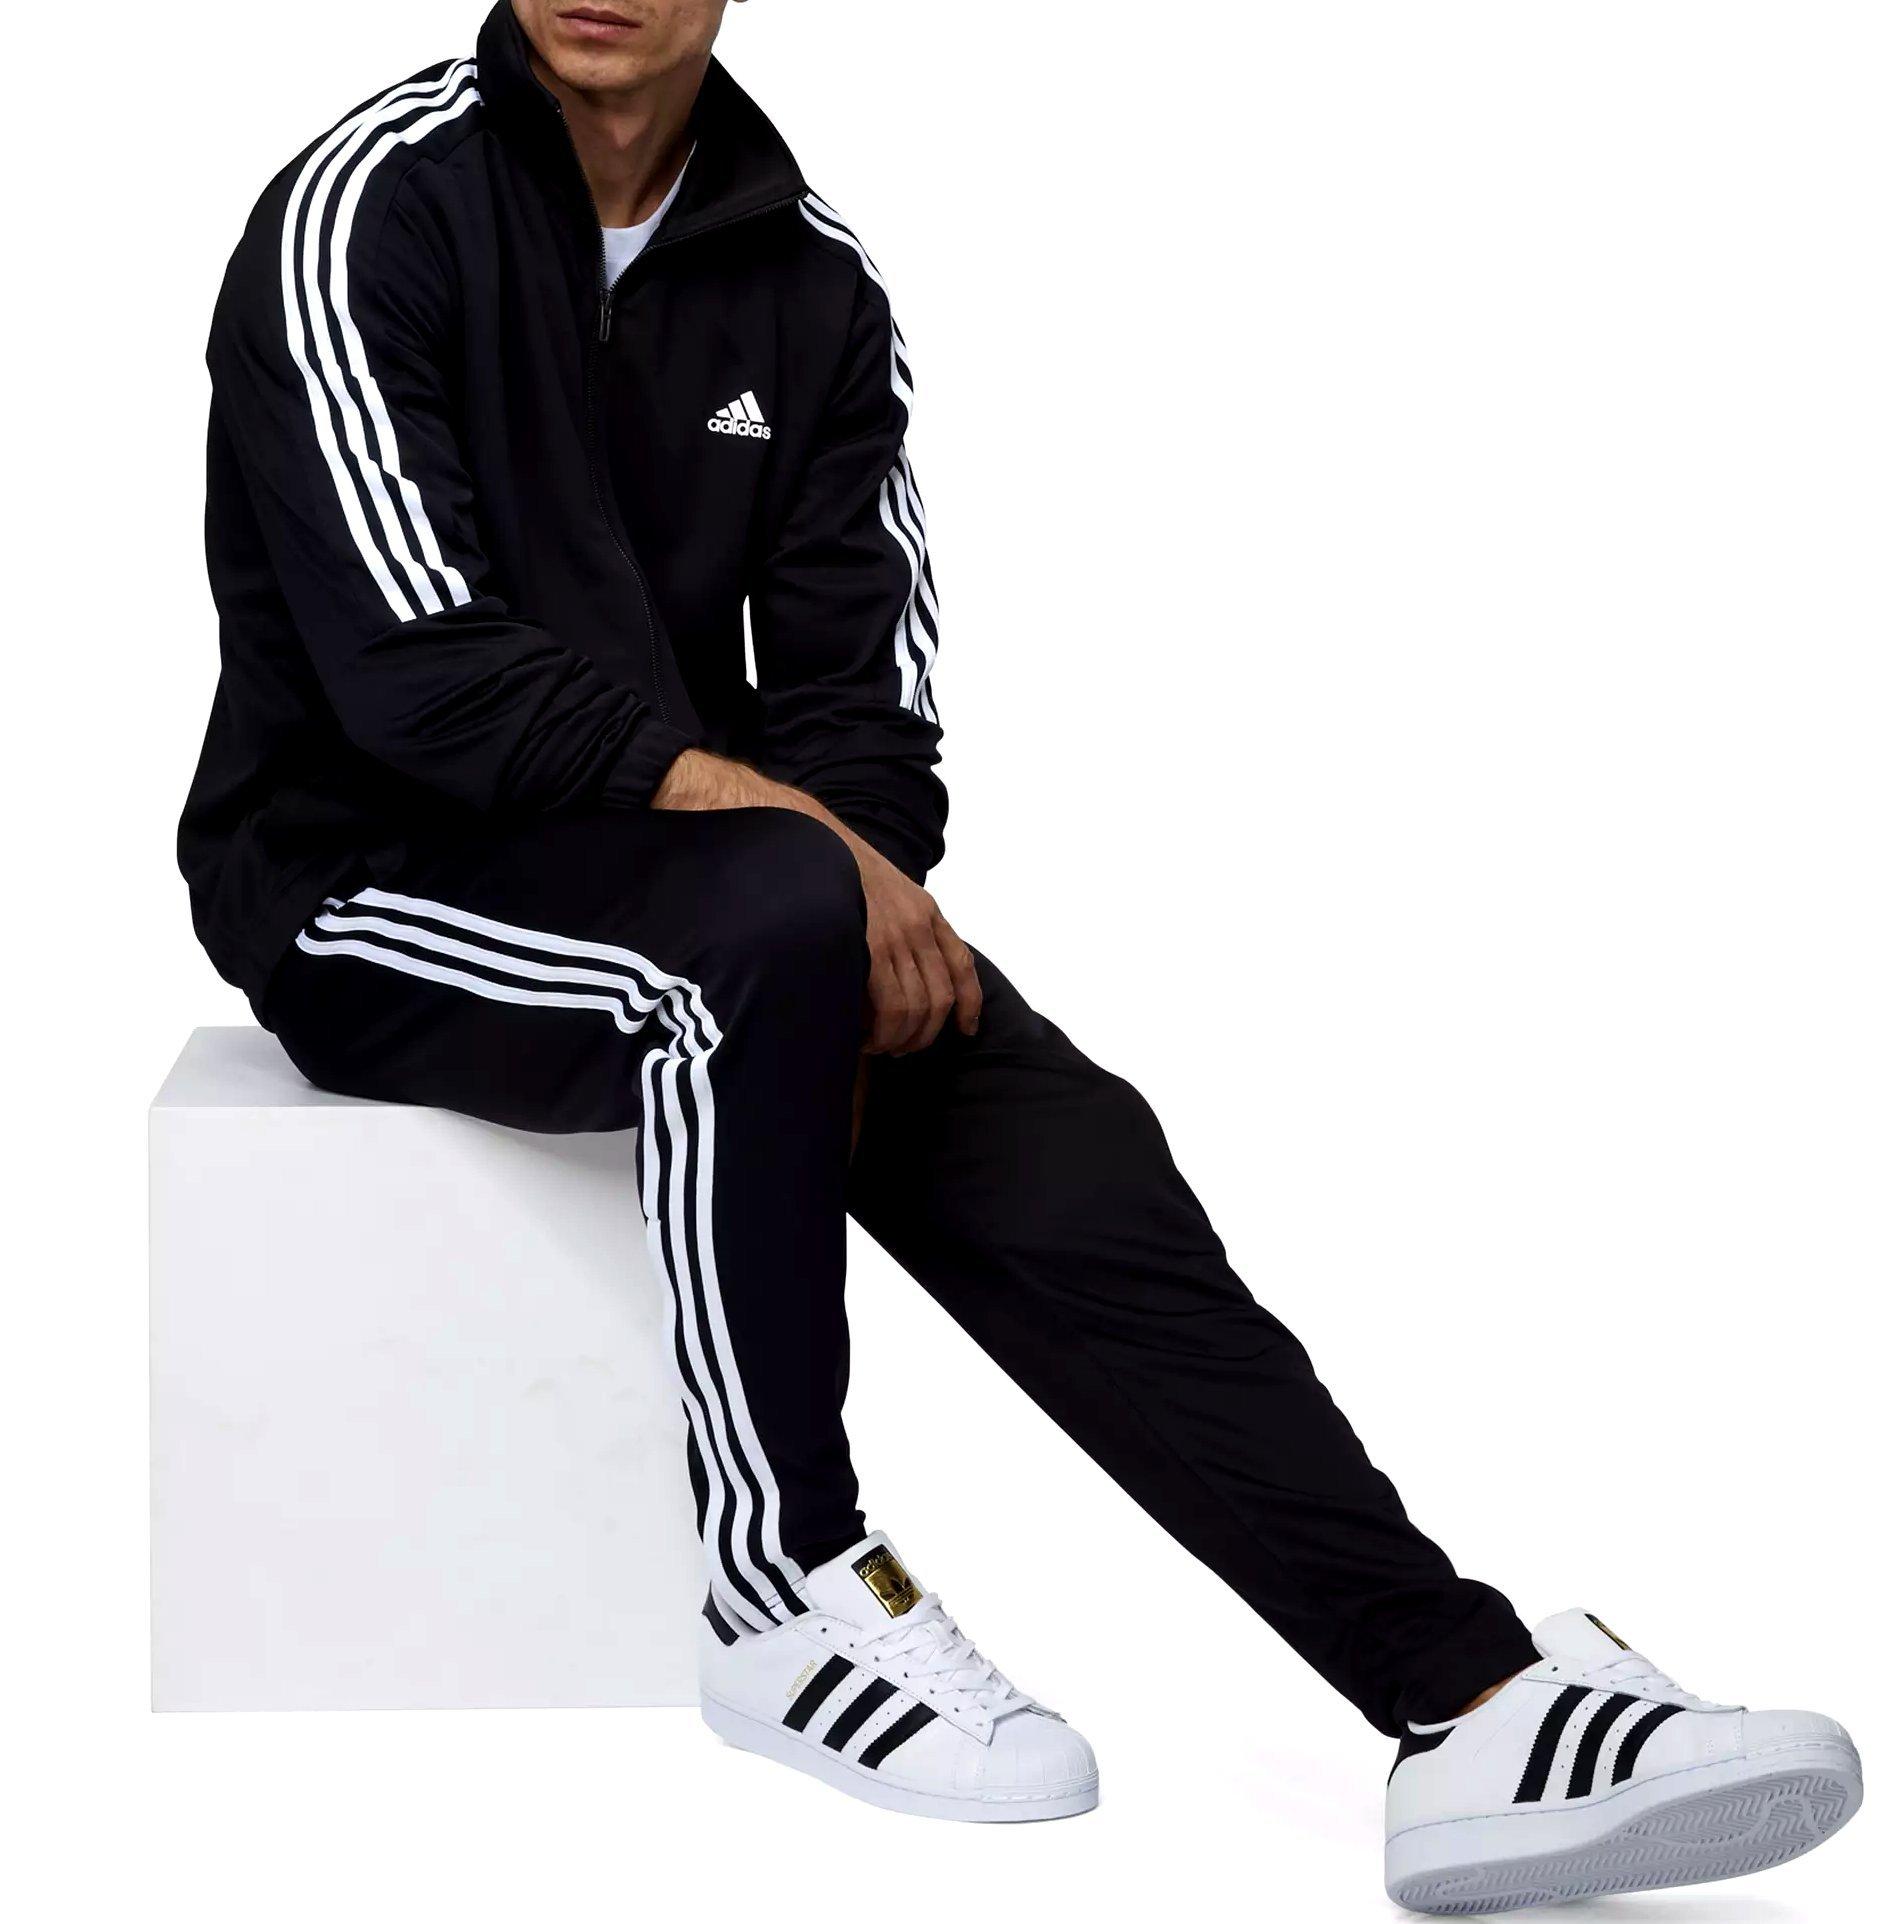 Adidas Tiro Track Suit 3 Stripes Tracksuit Black/White (XL)